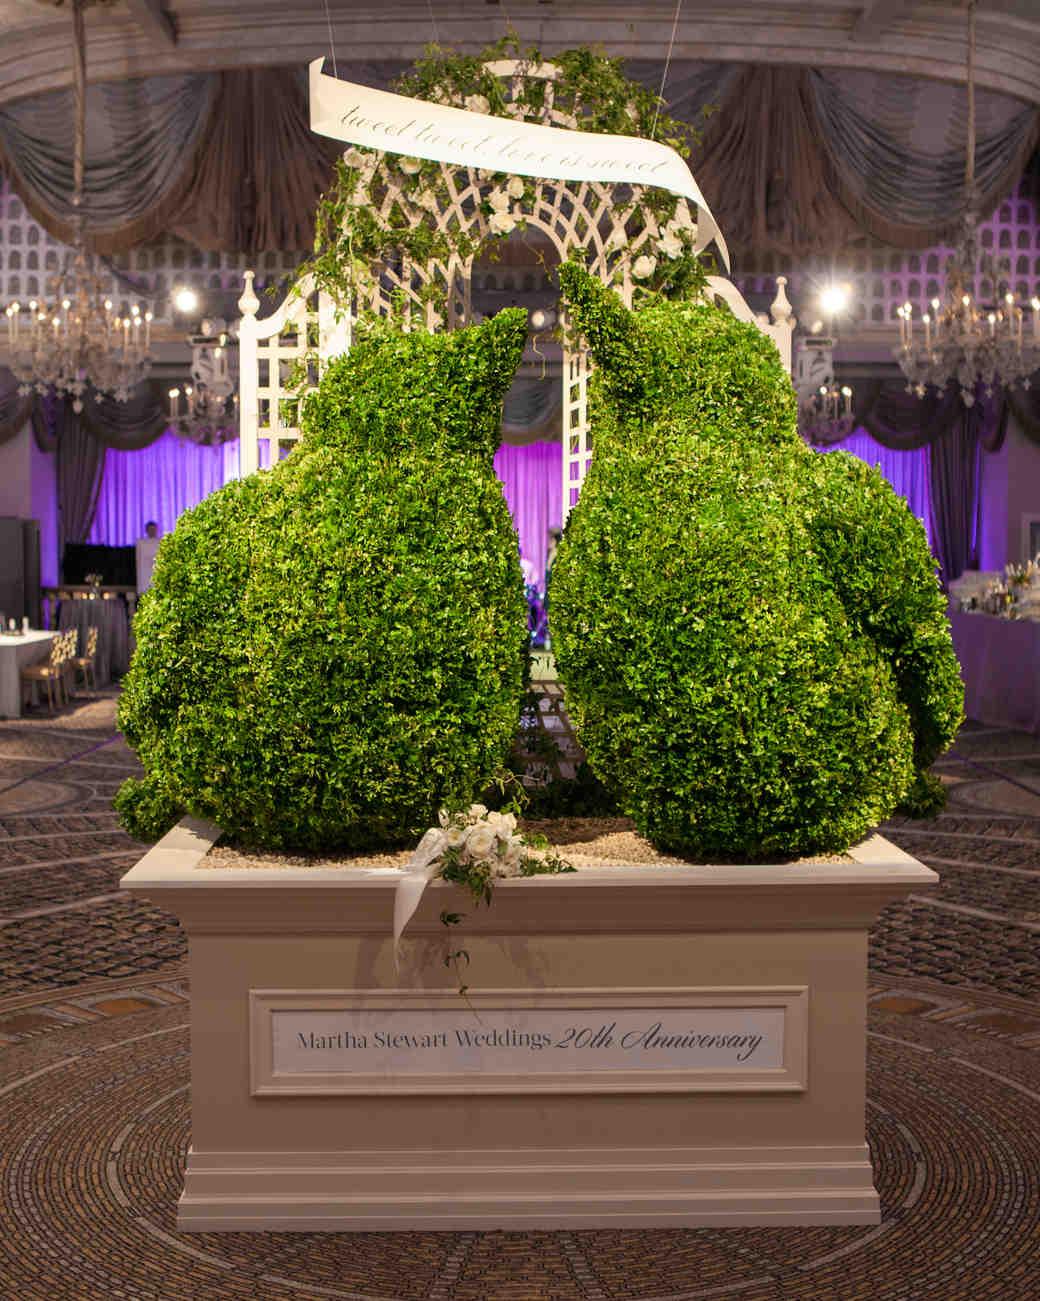 Martha Stewart Weddings Vendors